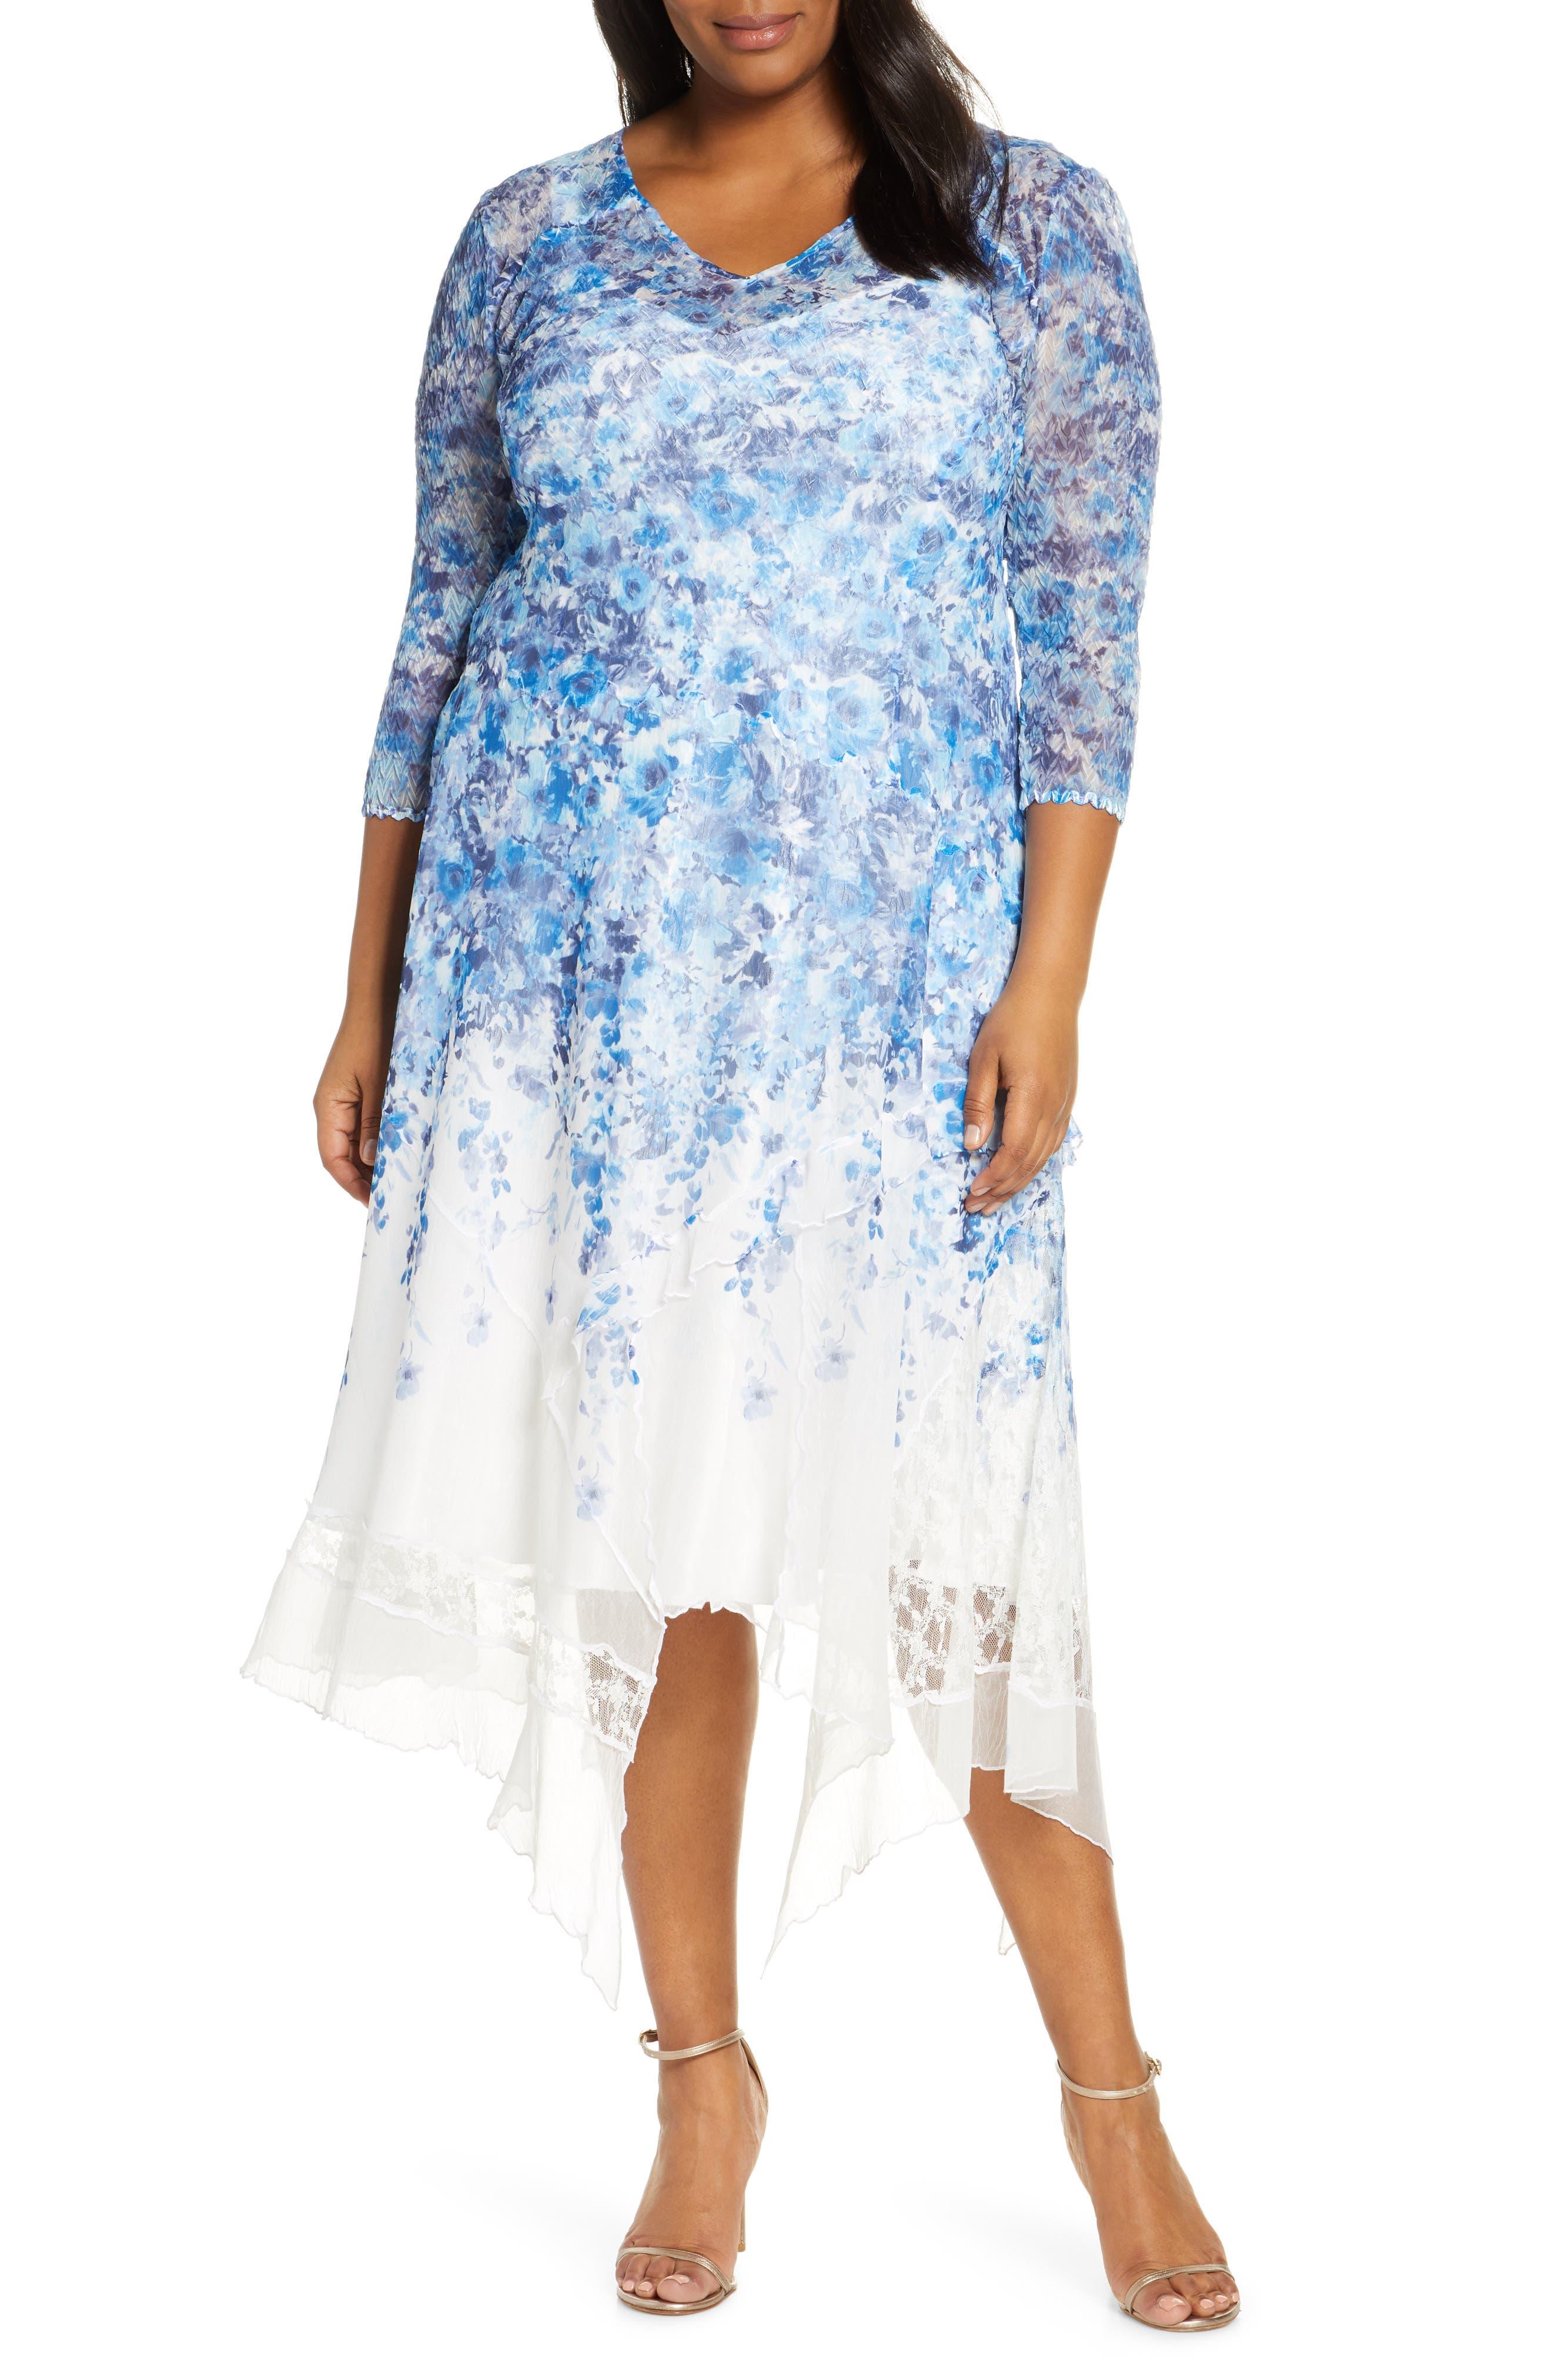 Plus Size Komarov Watercolor Print Chiffon Handkerchief Hem Dress, Blue